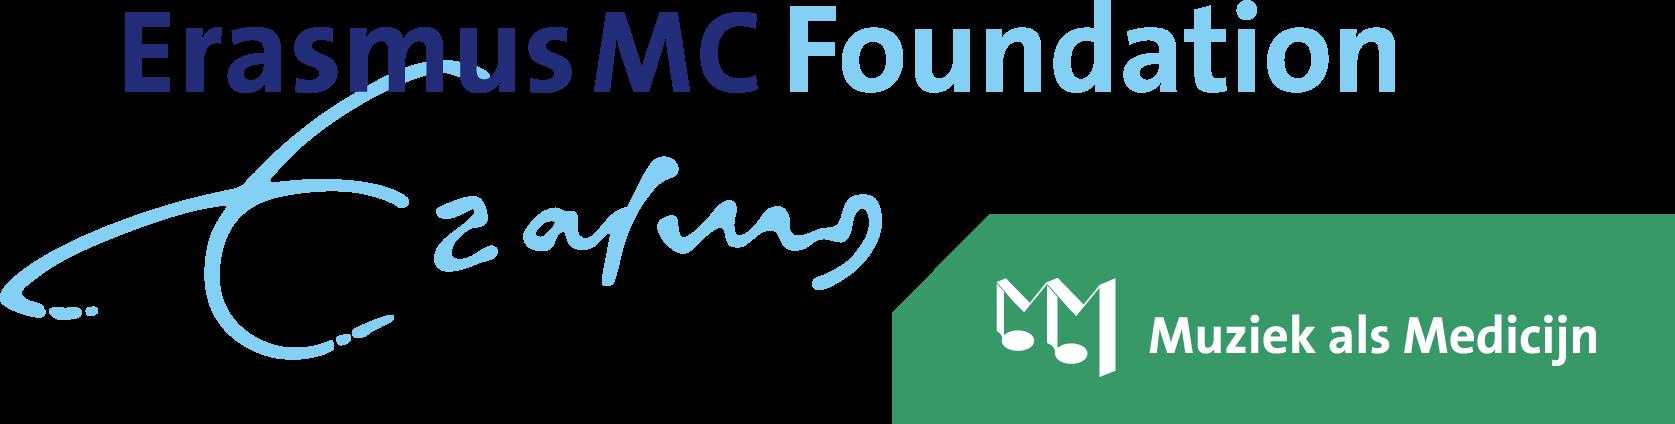 d1-logo-erasmusmcf-muziekalsmedicijn-cmyk